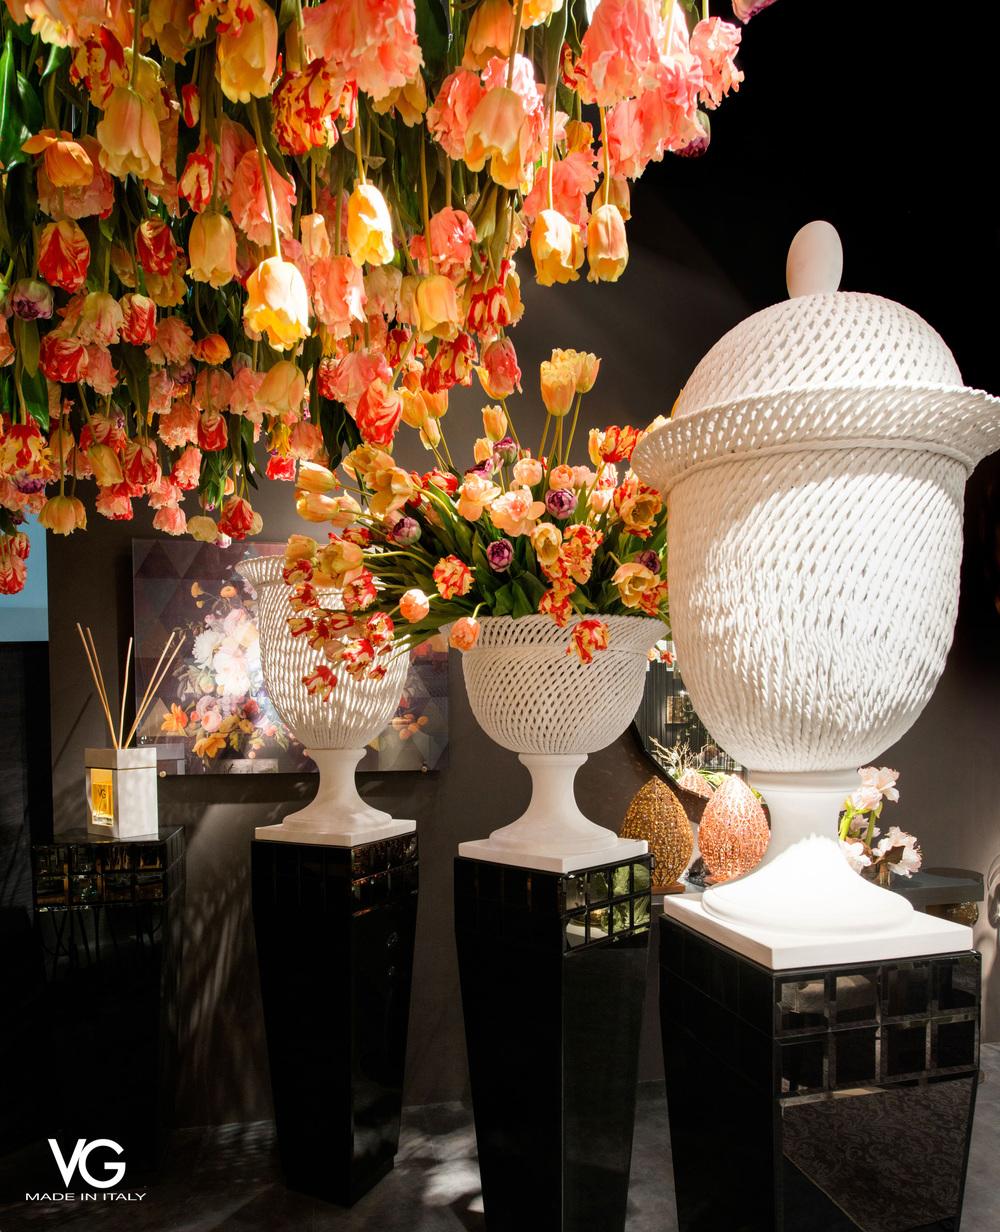 VG New Trend Faux Flowers 2016 Salone del Mobile | Masha Shapiro Agency.jpg